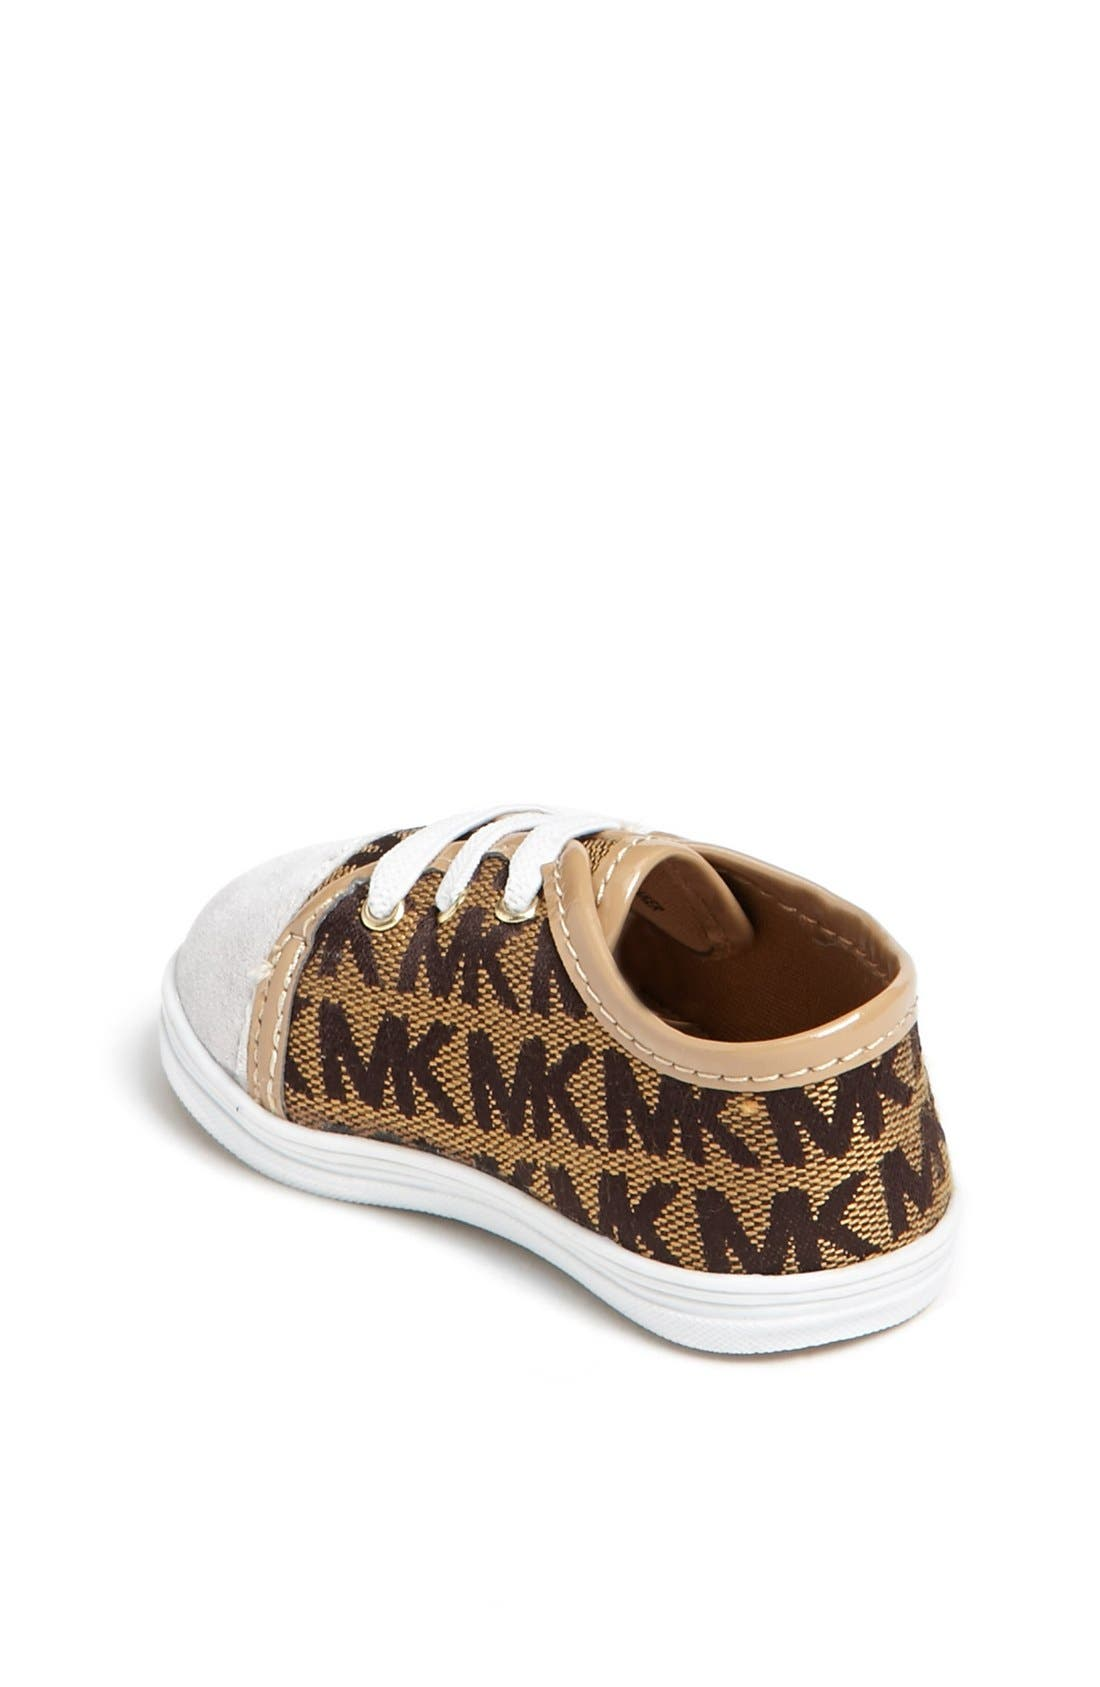 Alternate Image 2  - MICHAEL Michael Kors 'Baby Monogram' Crib Shoe (Baby)